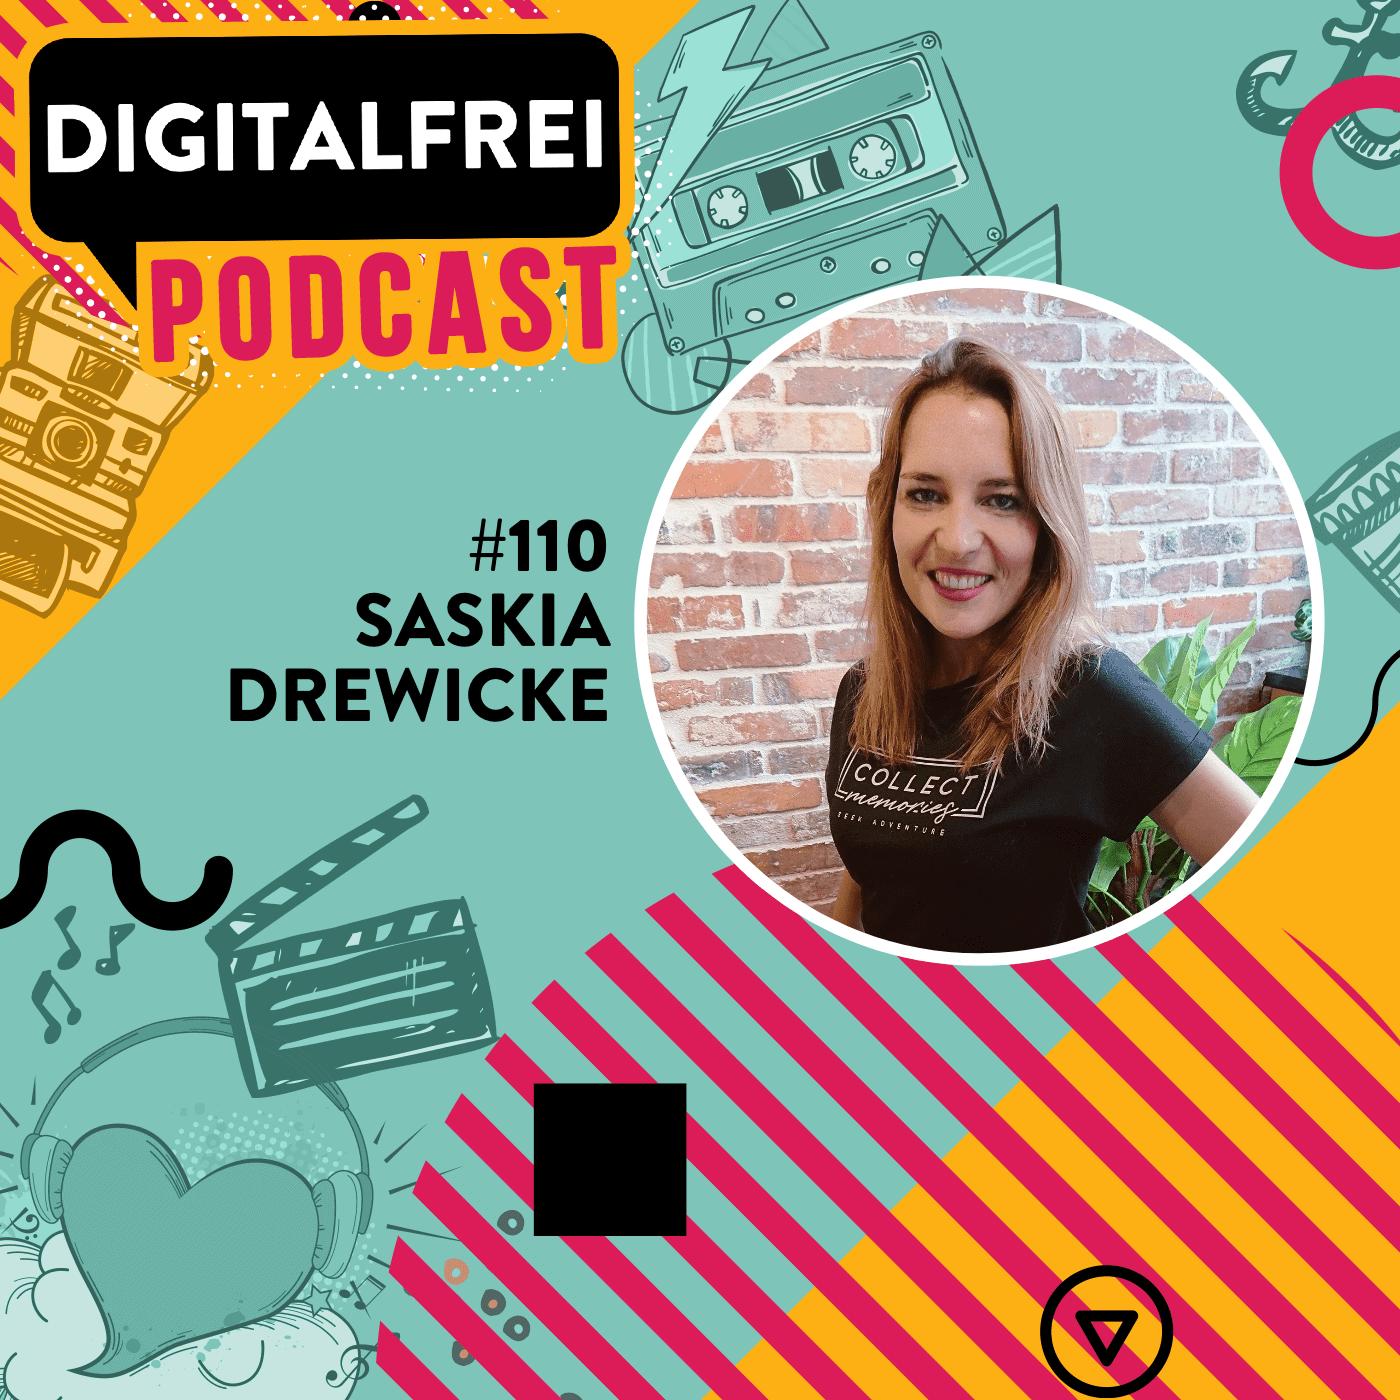 Die Sparheldin Saskia Drewicke im Digitalfrei Podcast mit Sascha Feldmann